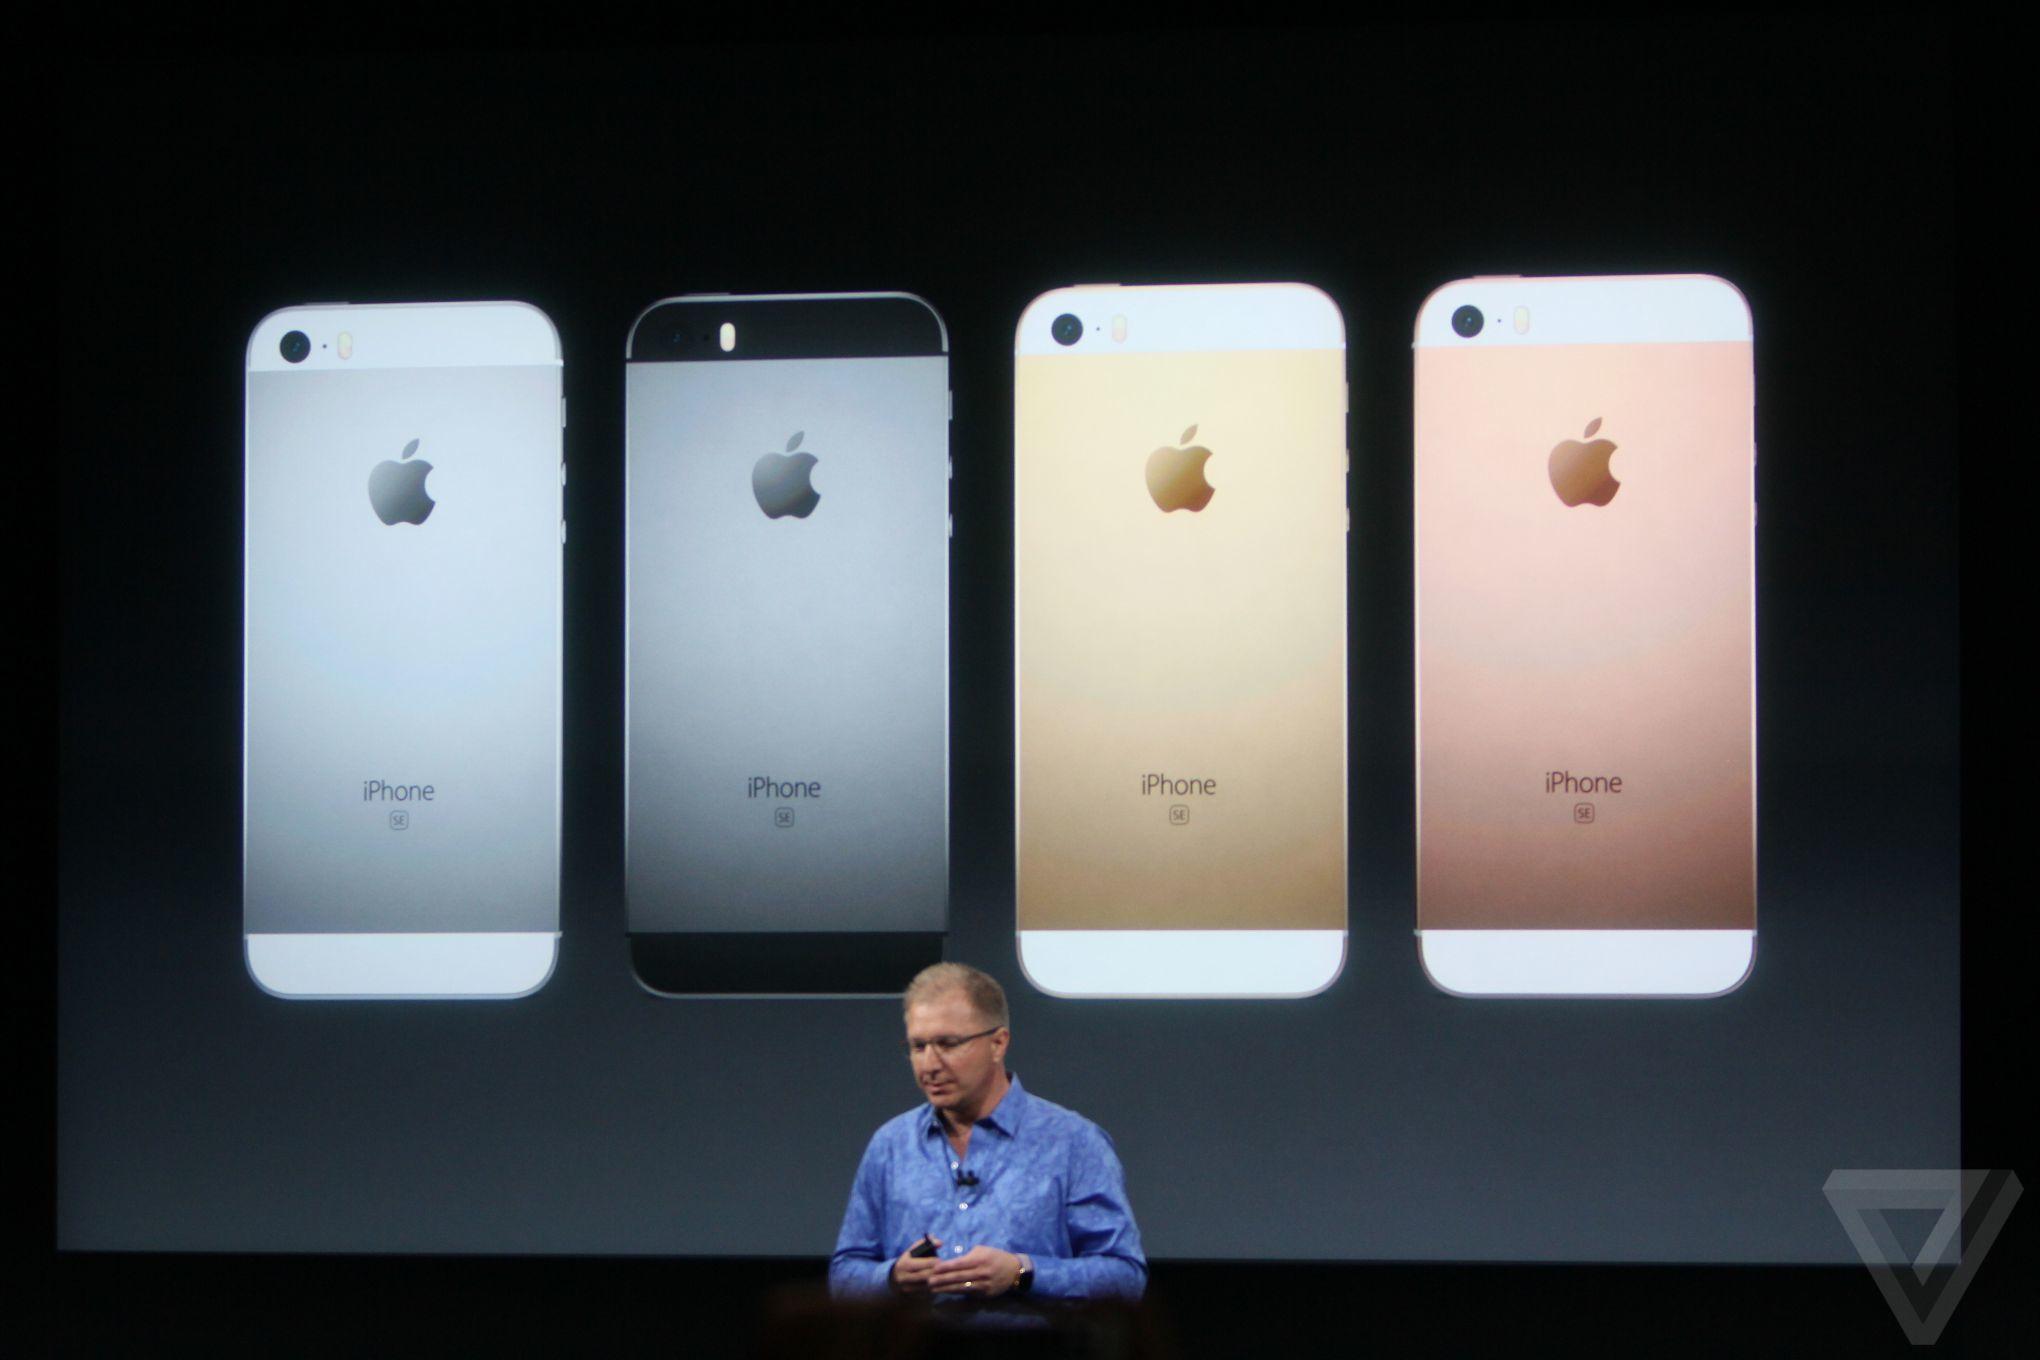 Apple iPhone SE announcement photos